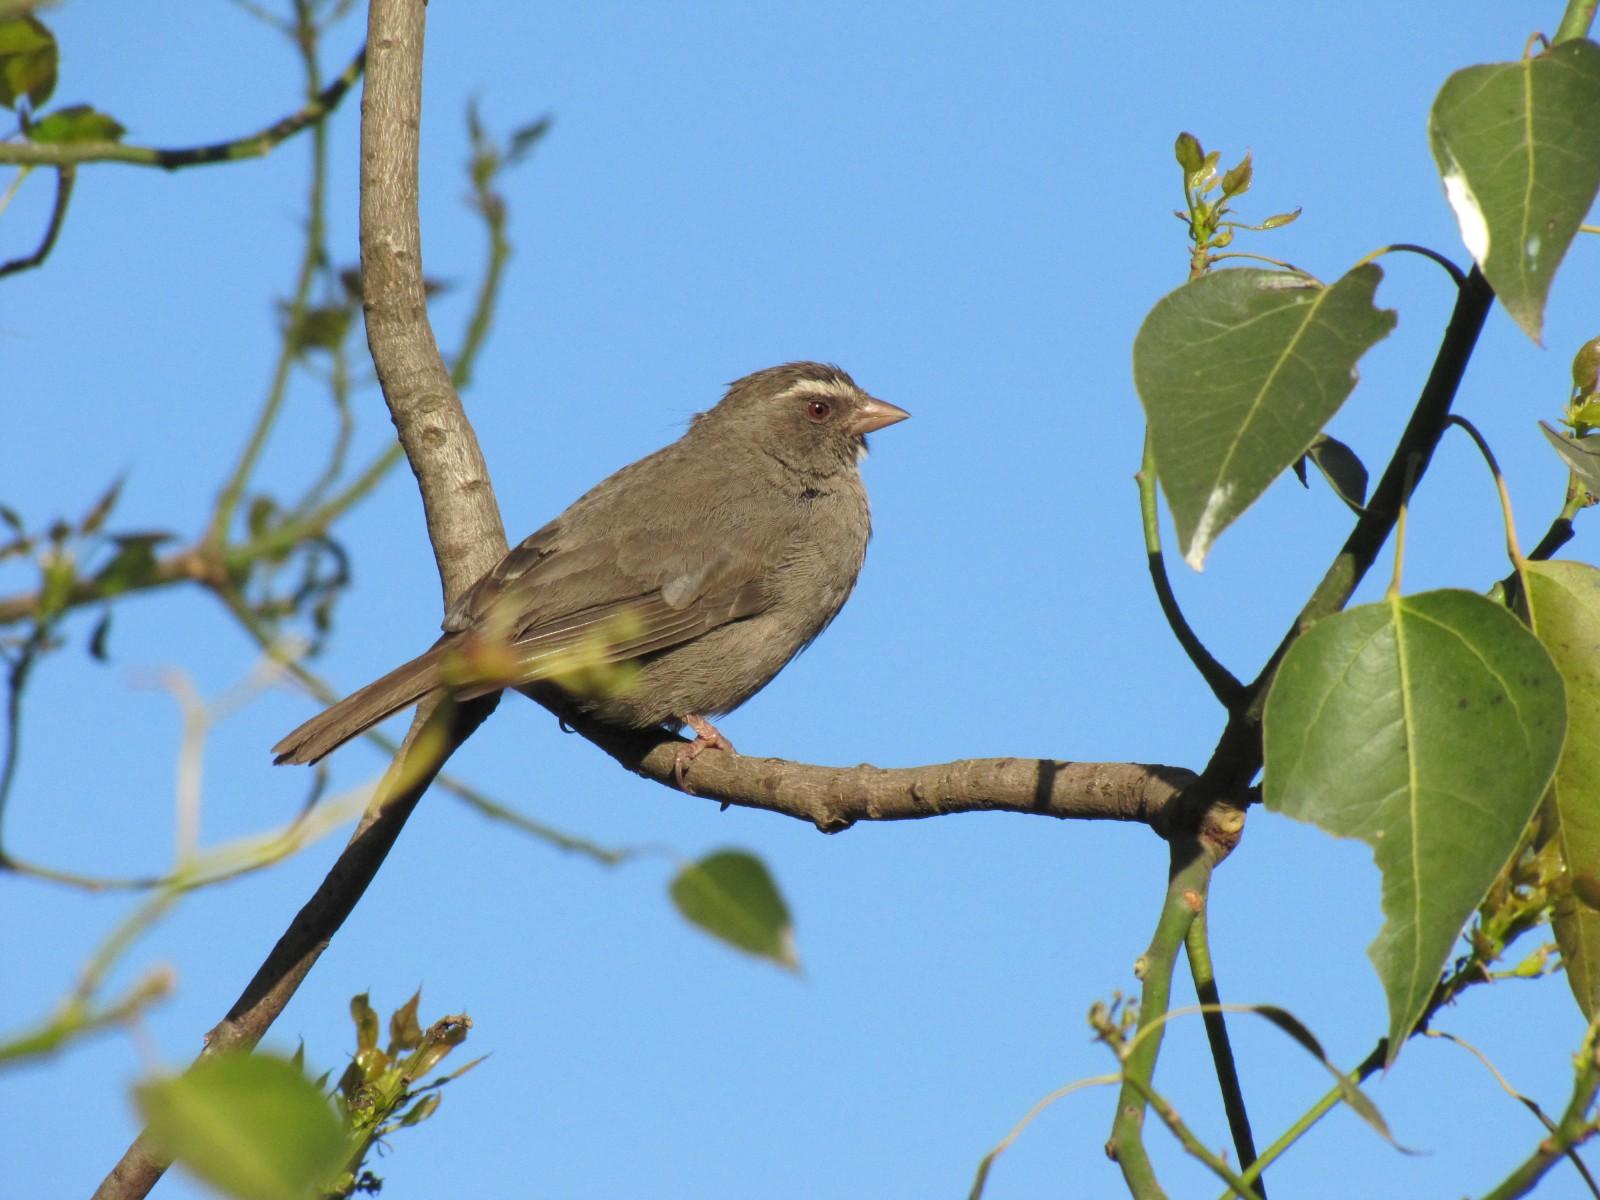 Brown-rumped Seedeater, Ethiopia - Trevor's Birding